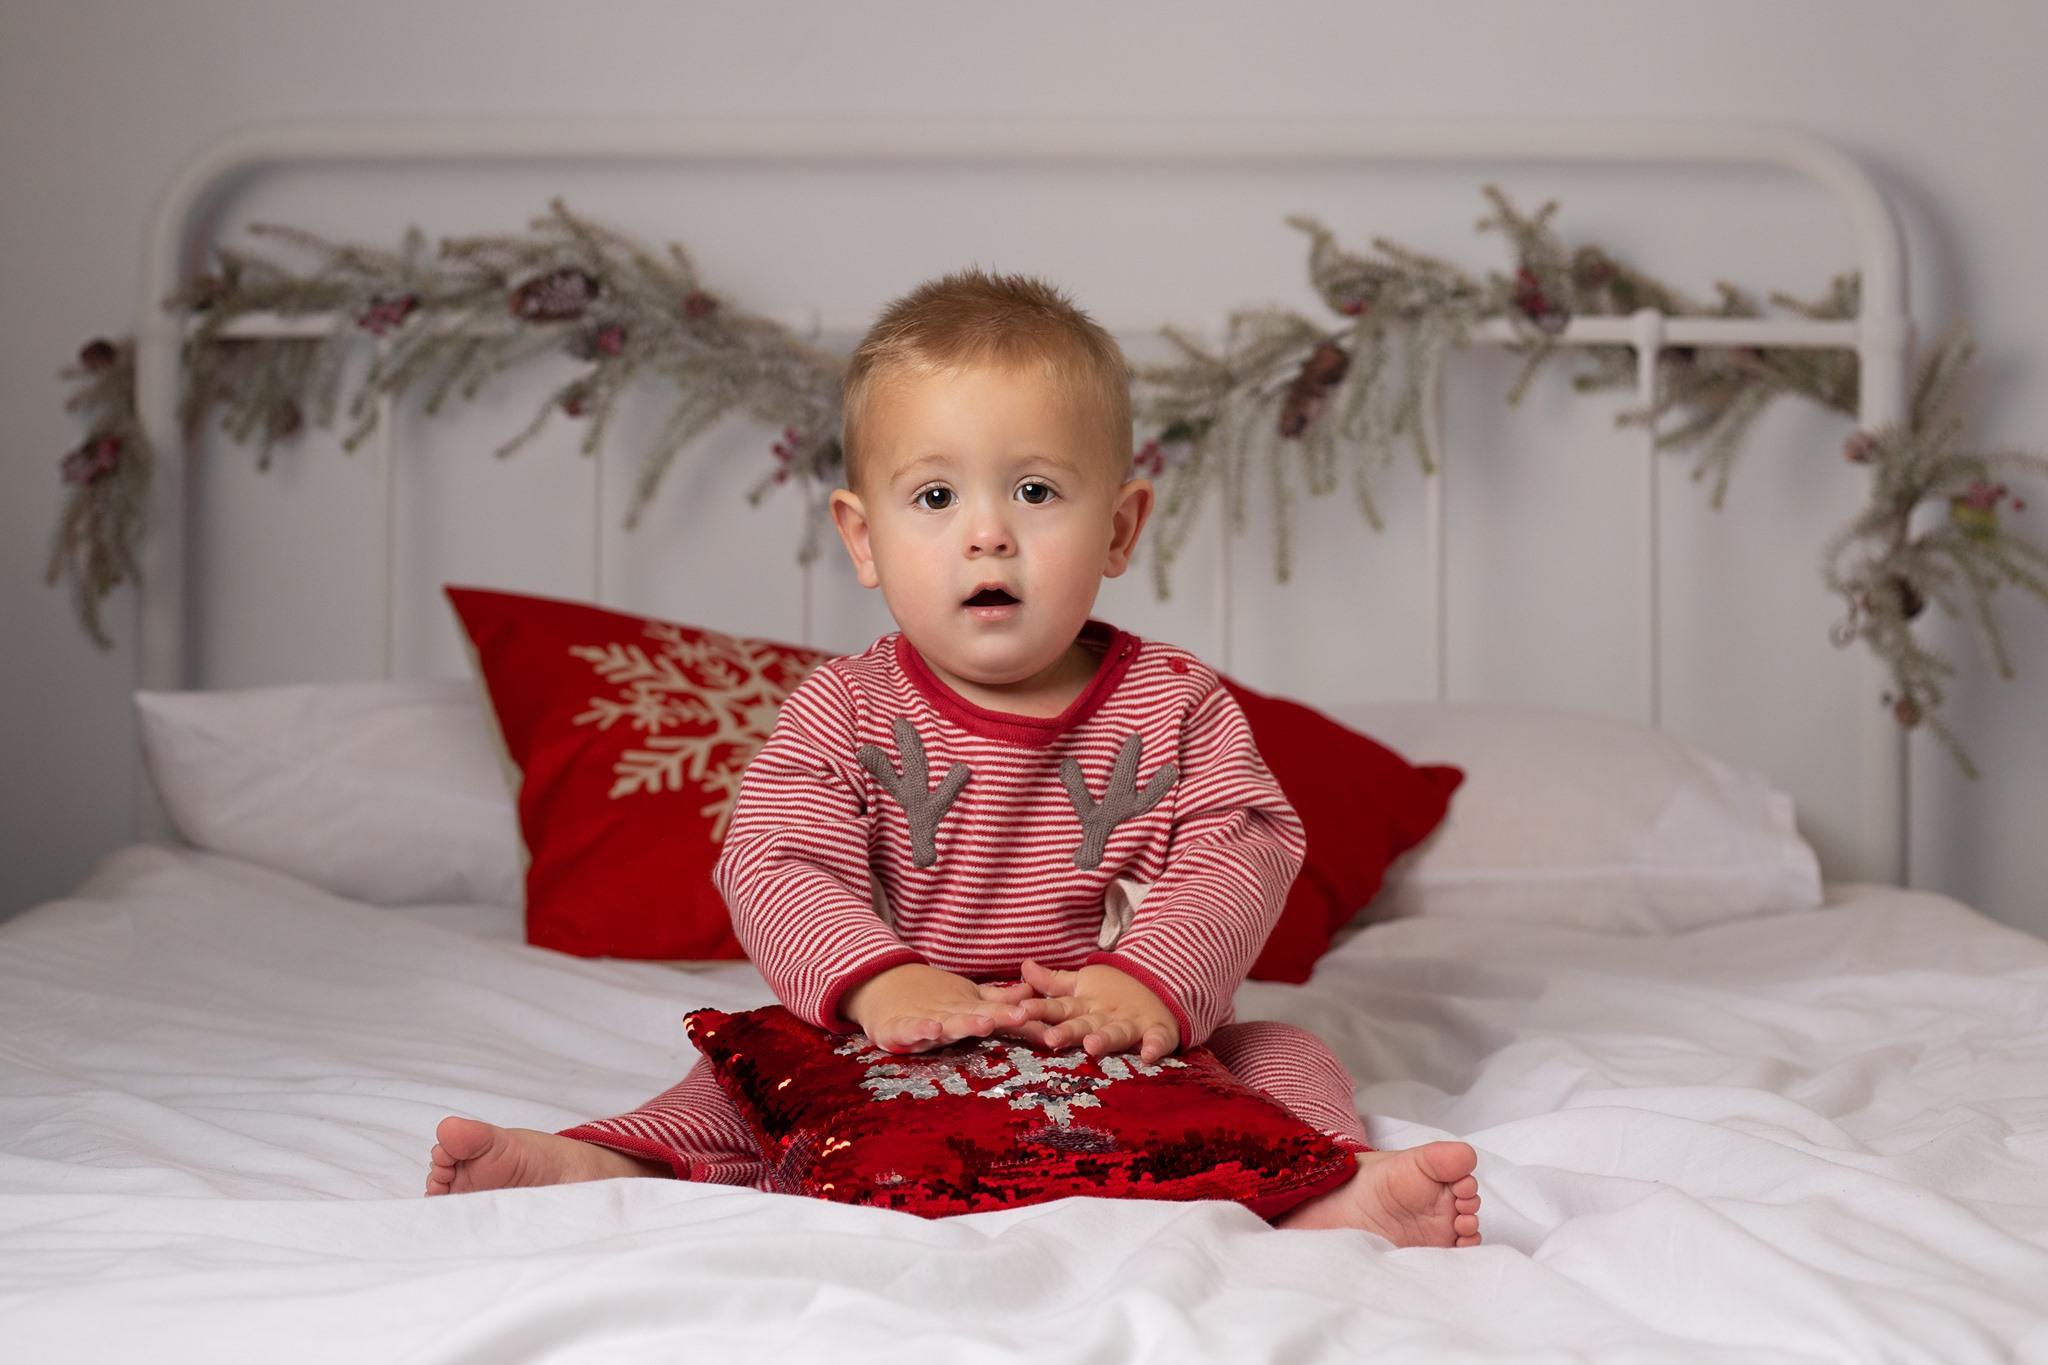 CHRISTMAS-MINI-XMAS-SESSION-CHRISTMAS-PHOTOSHOOT-CHRISTMAS-BED-WHITE-SET-WILLENHALL-WOLVERHAMPTON-WEST-MIDLANDS-6.jpg